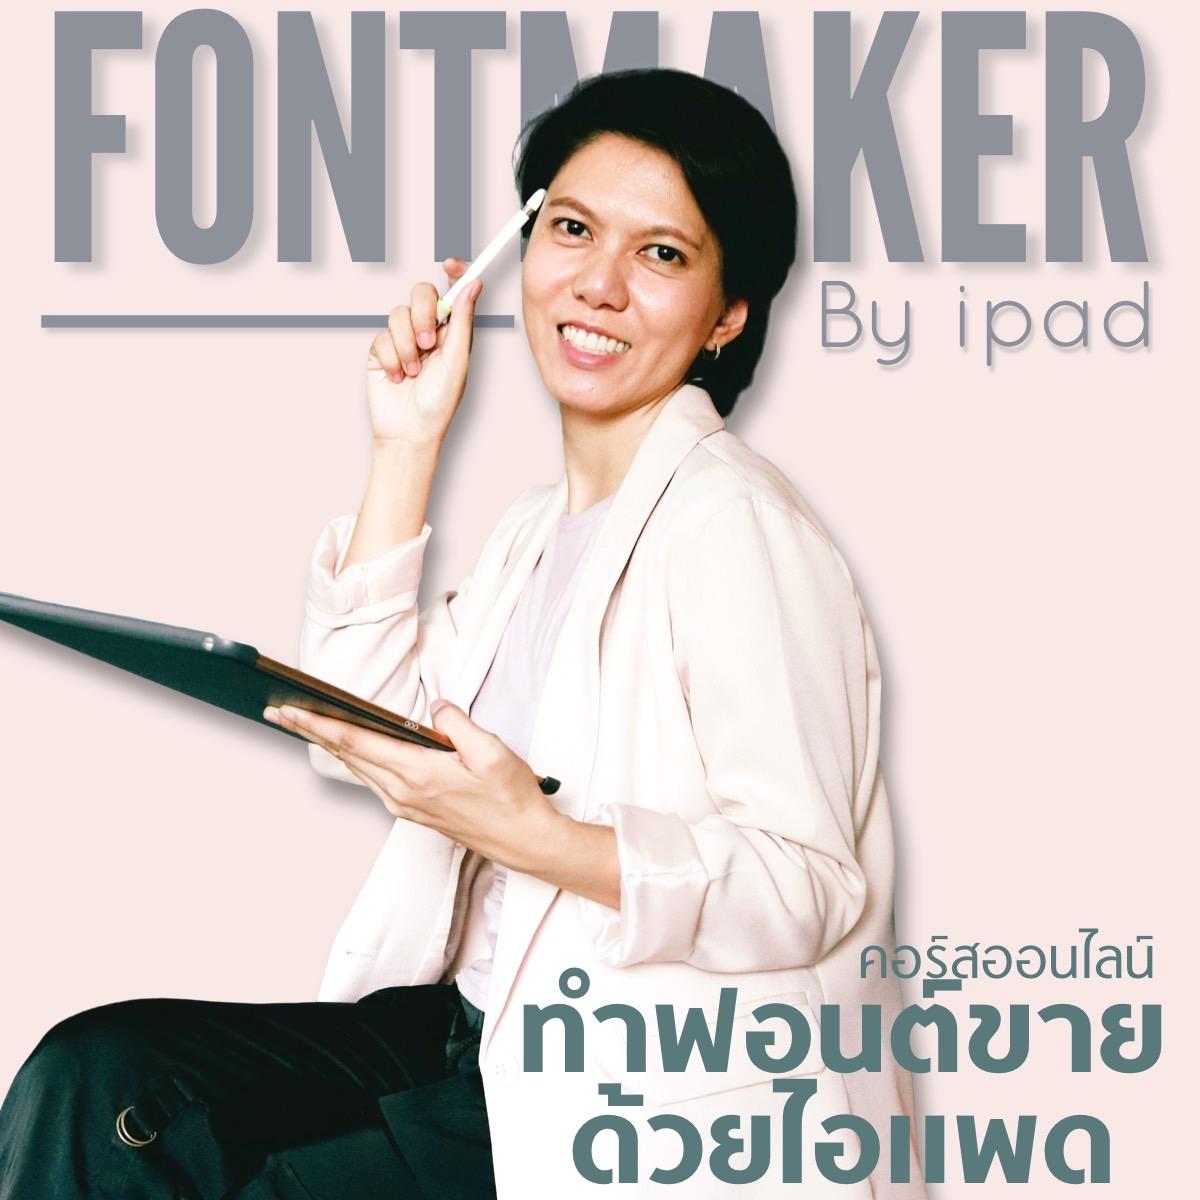 Font Maker By iPad